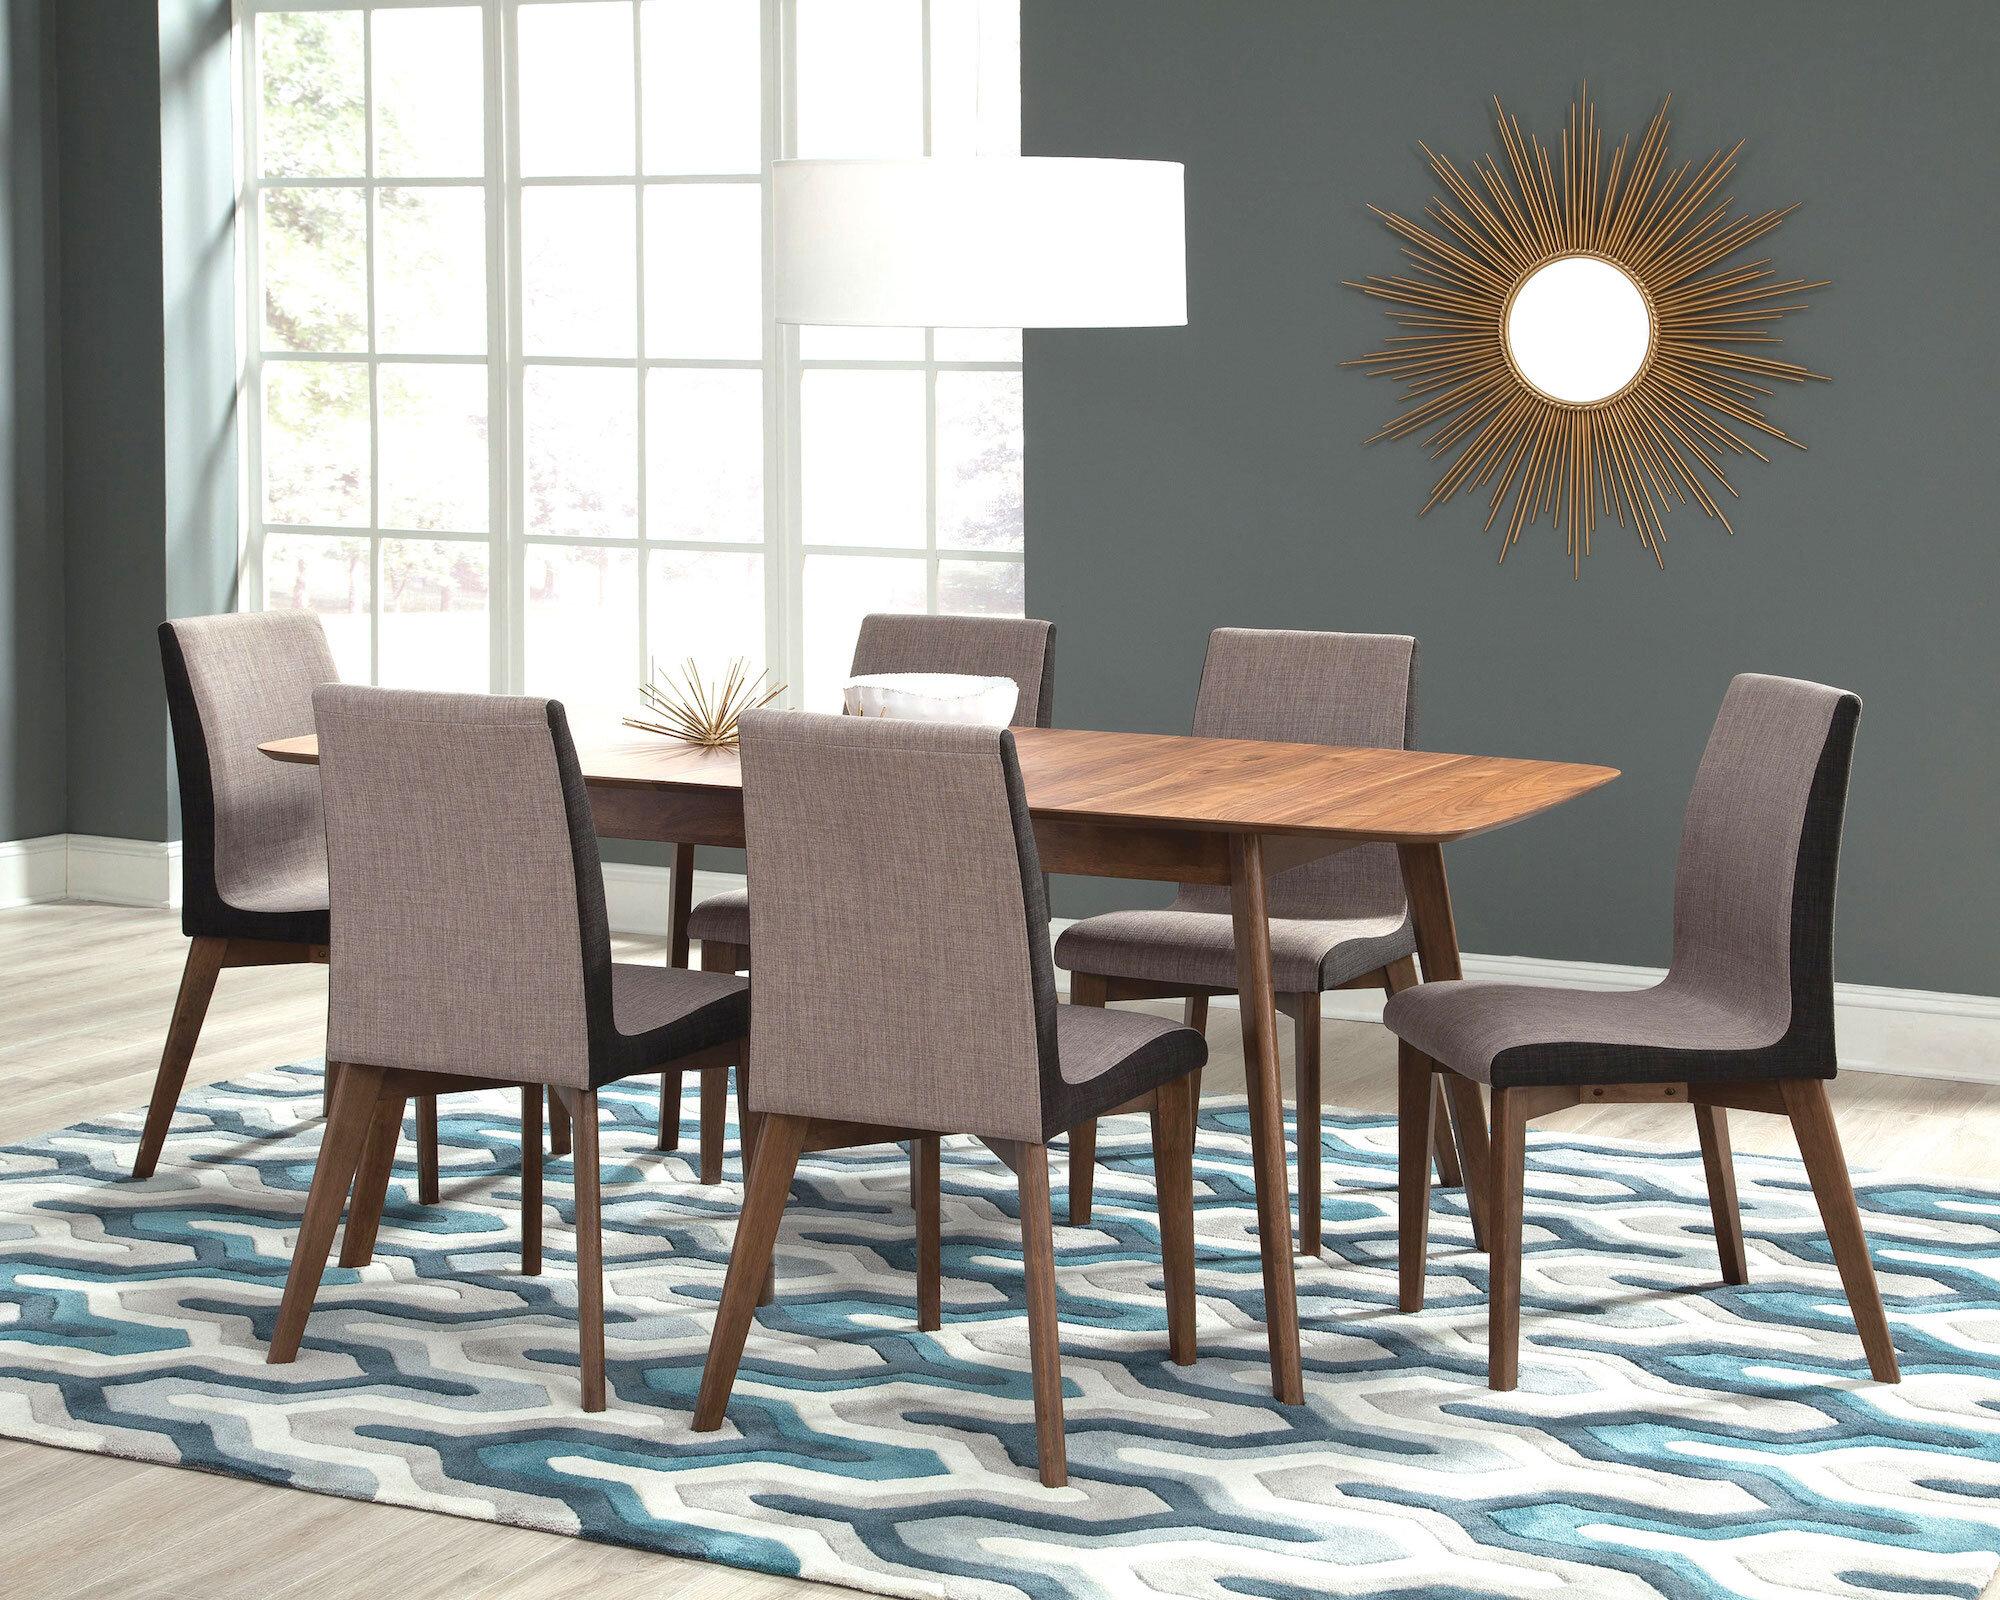 Wood Brayden Studio Kitchen Dining Room Sets You Ll Love In 2021 Wayfair